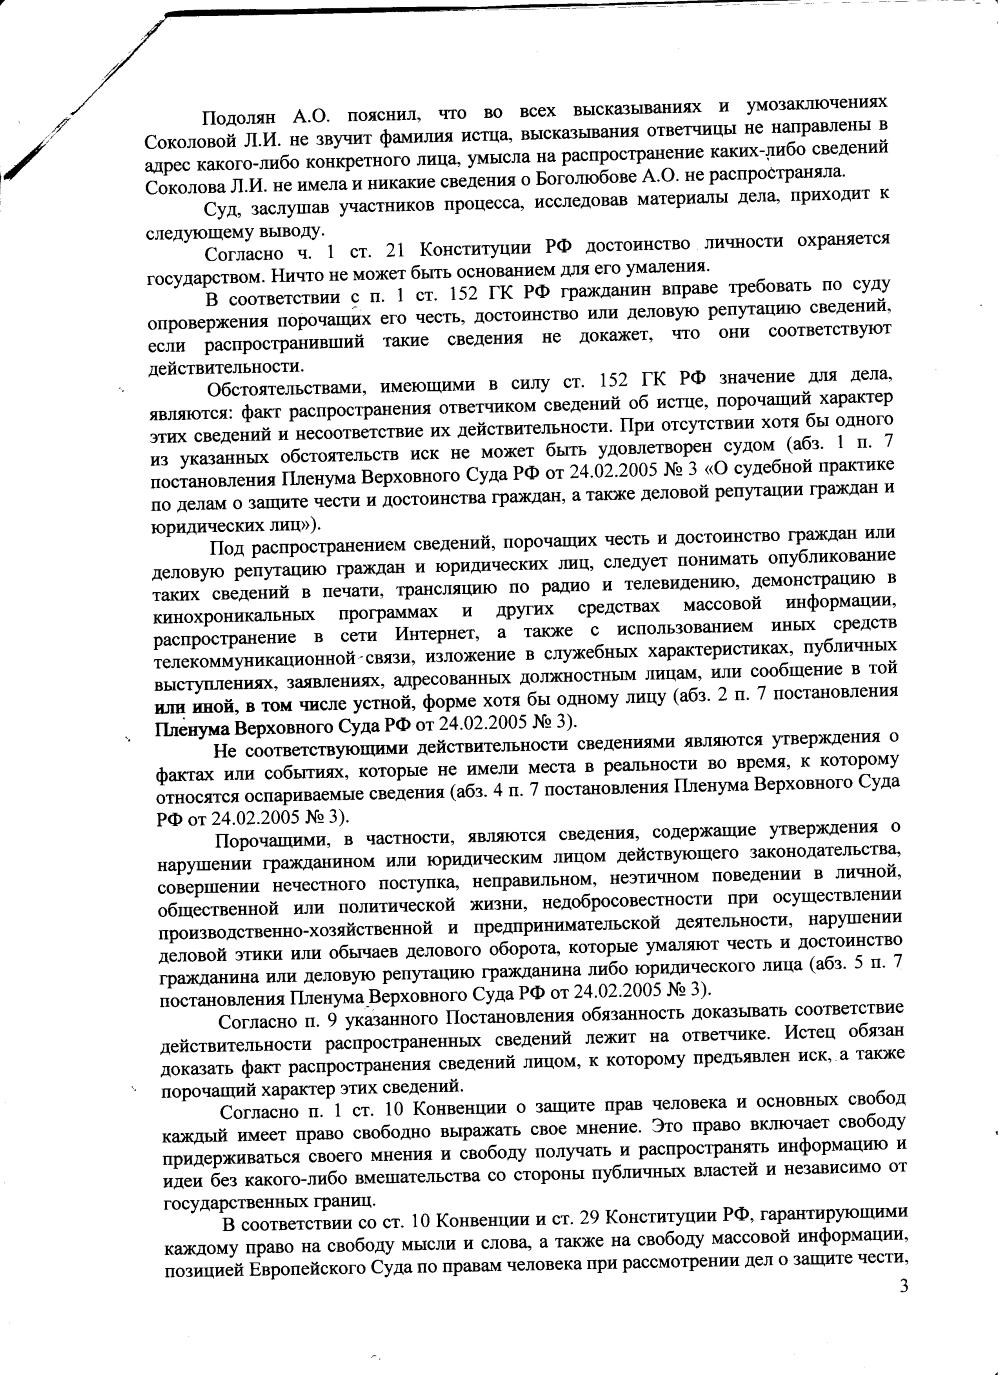 https://sontgranit.ru/forum/img/sokol/20180209-решение-4.png